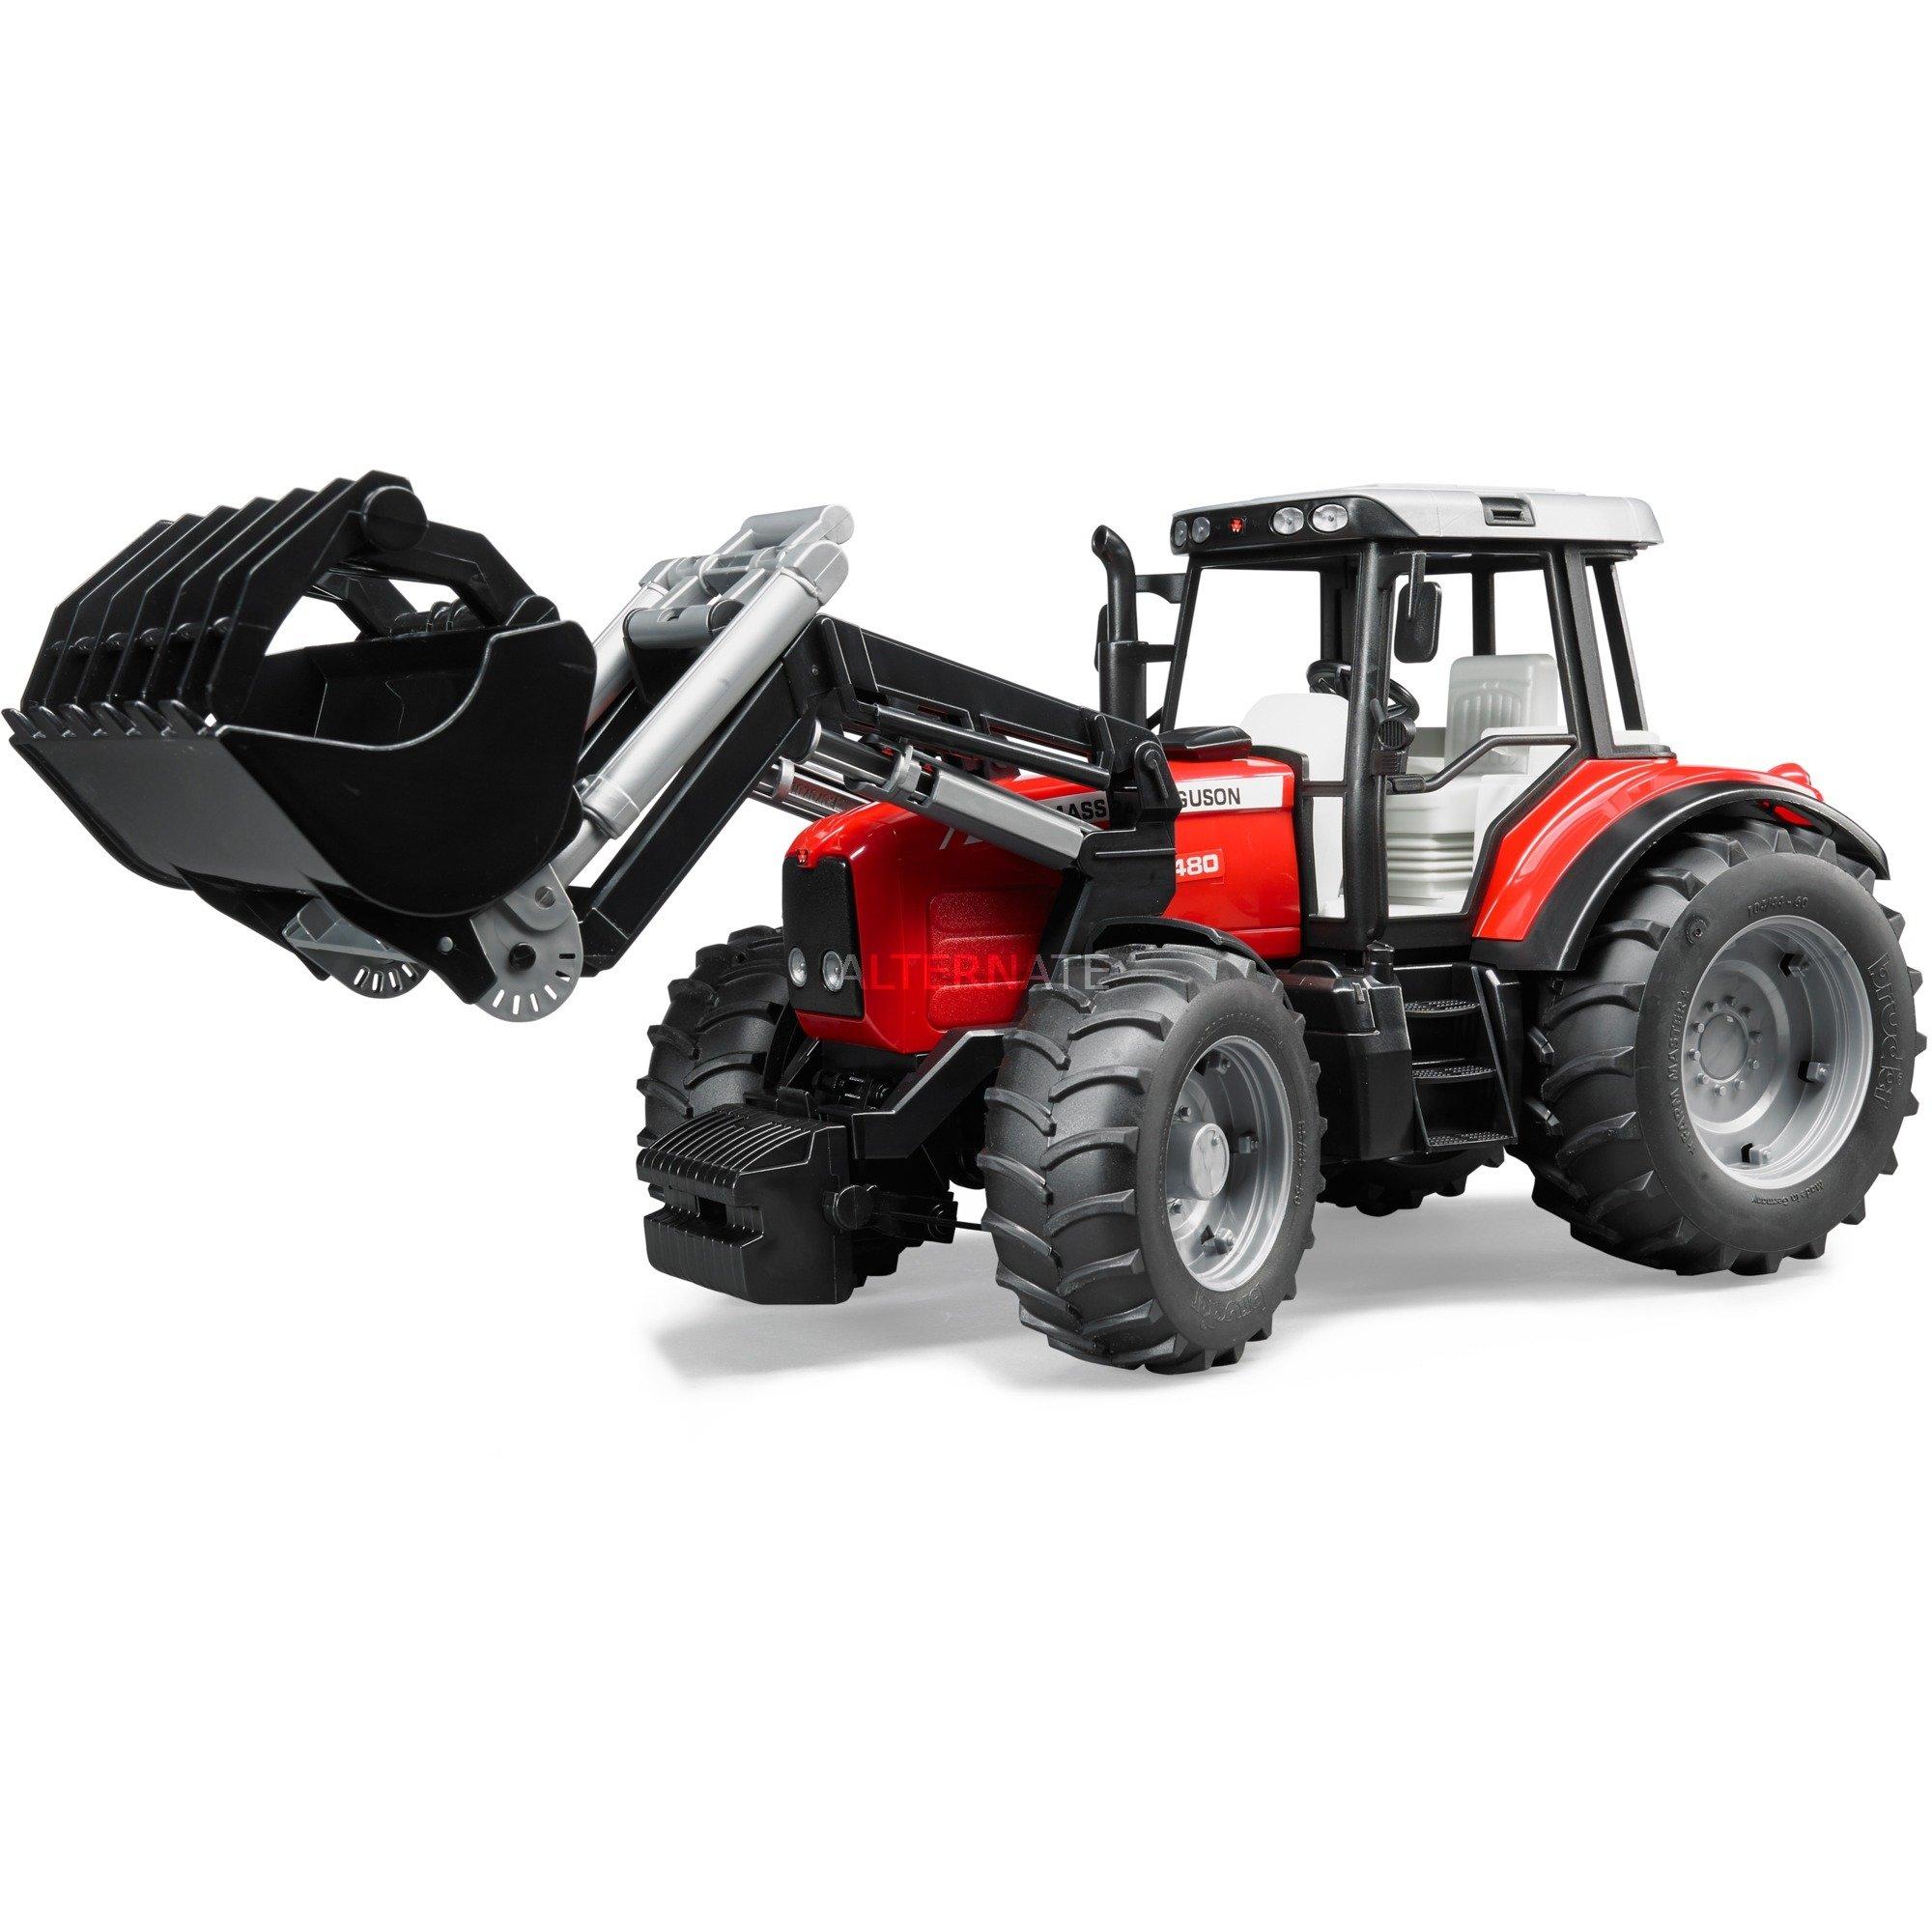 02042 modelo de vehículo de tierra Previamente montado Modelo a escala de tractor 1:16, Automóvil de construcción